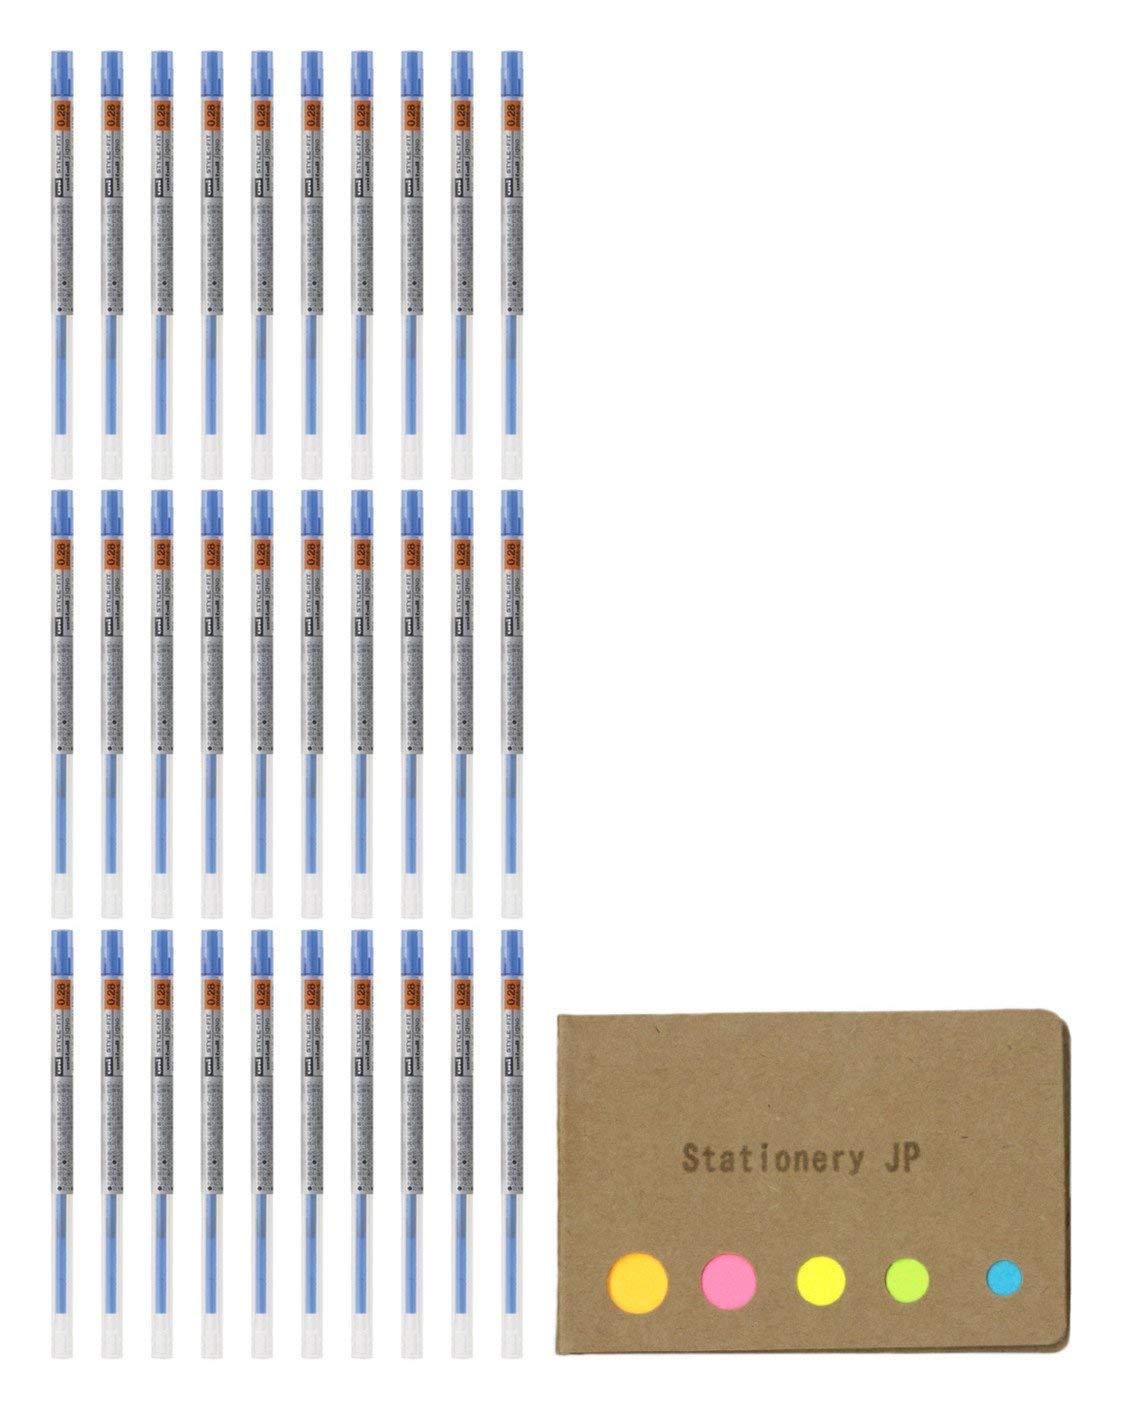 Uni-ball Signo Gel Ink Refills for Uni Style Fit Gel Multi Pen 0.28mm Blue Ink, 30-pack, Sticky Notes Value Set